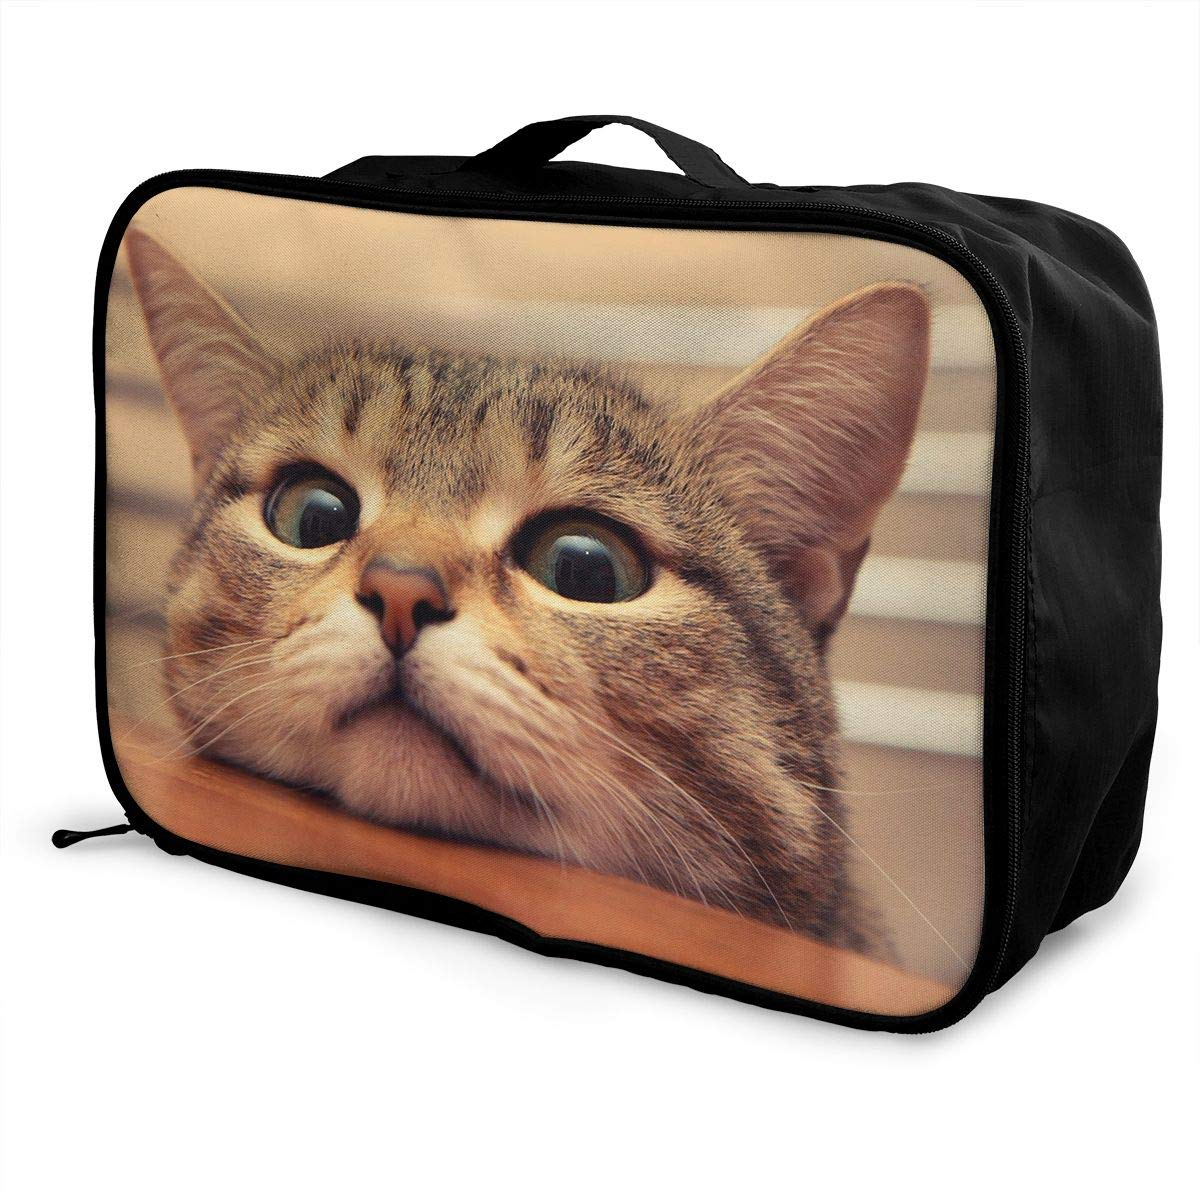 Travel Luggage Duffle Bag Lightweight Portable Handbag Cute Cat Print Large Capacity Waterproof Foldable Storage Tote